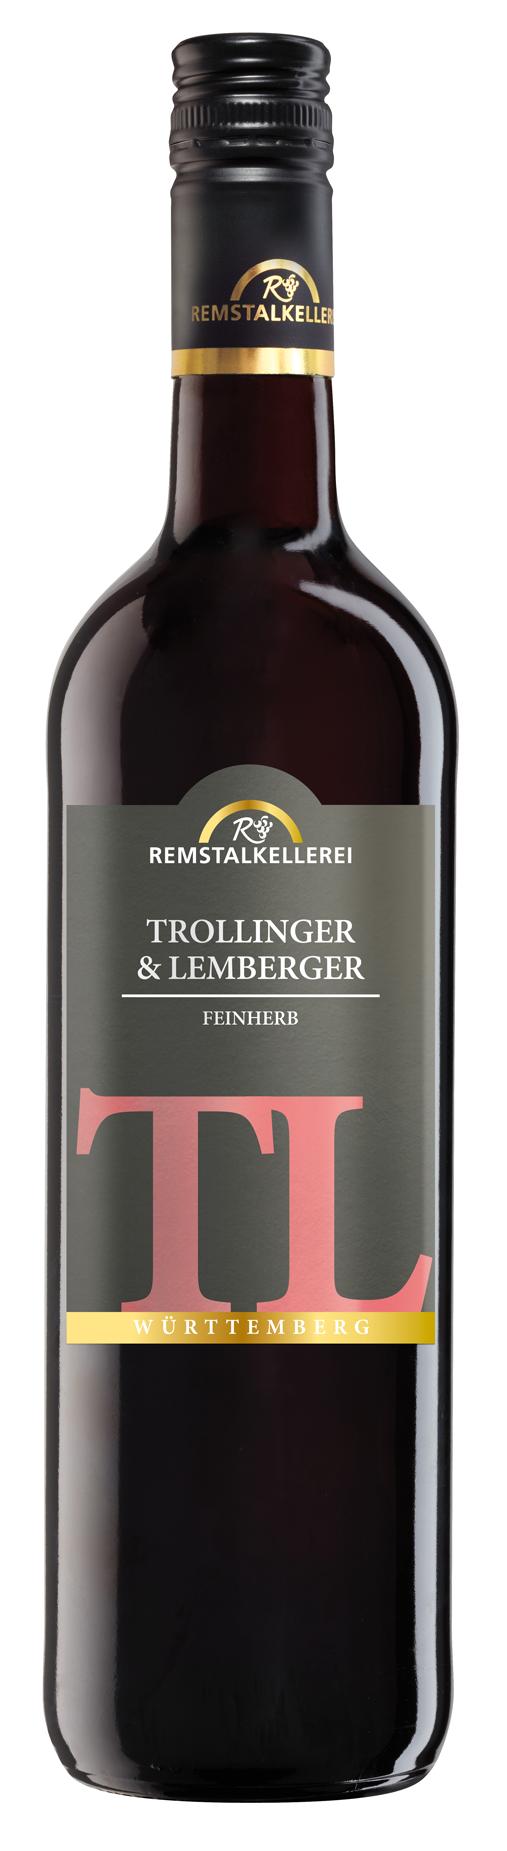 "Trollinger mit Lemberger ""TL"" feinherb"